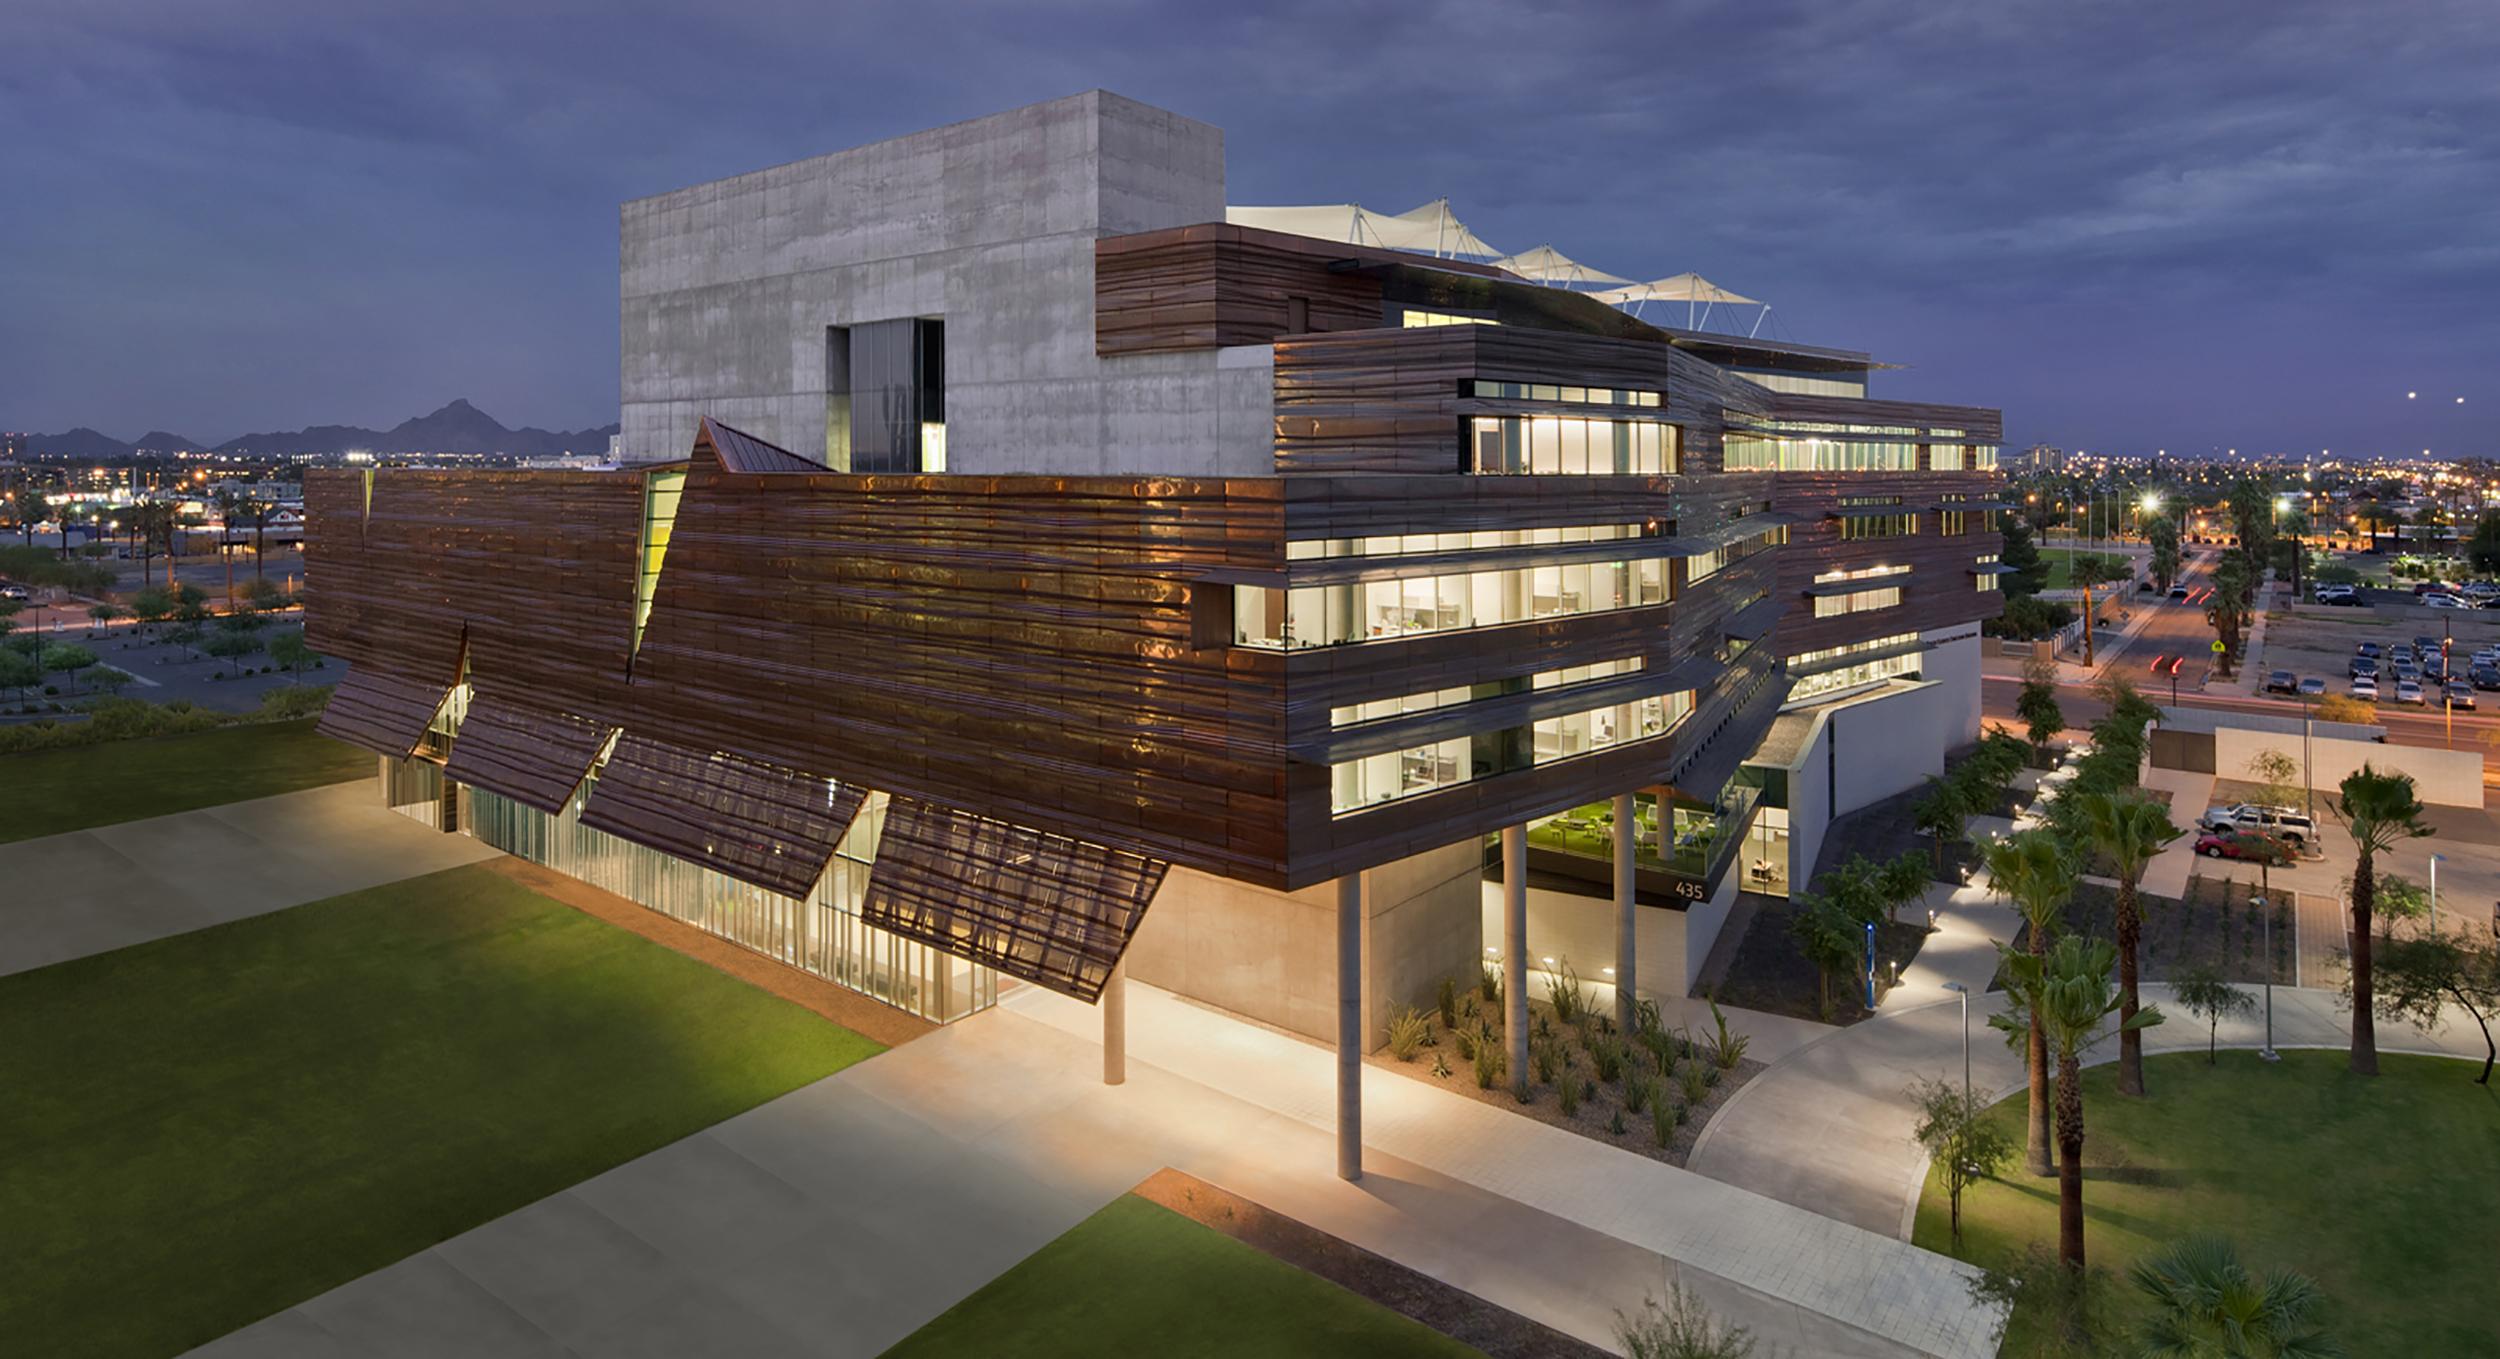 UNIVERSITY OF ARIZONA - HEALTH SCIENCES EDUCATION BUILDING   Phoenix, Arizona